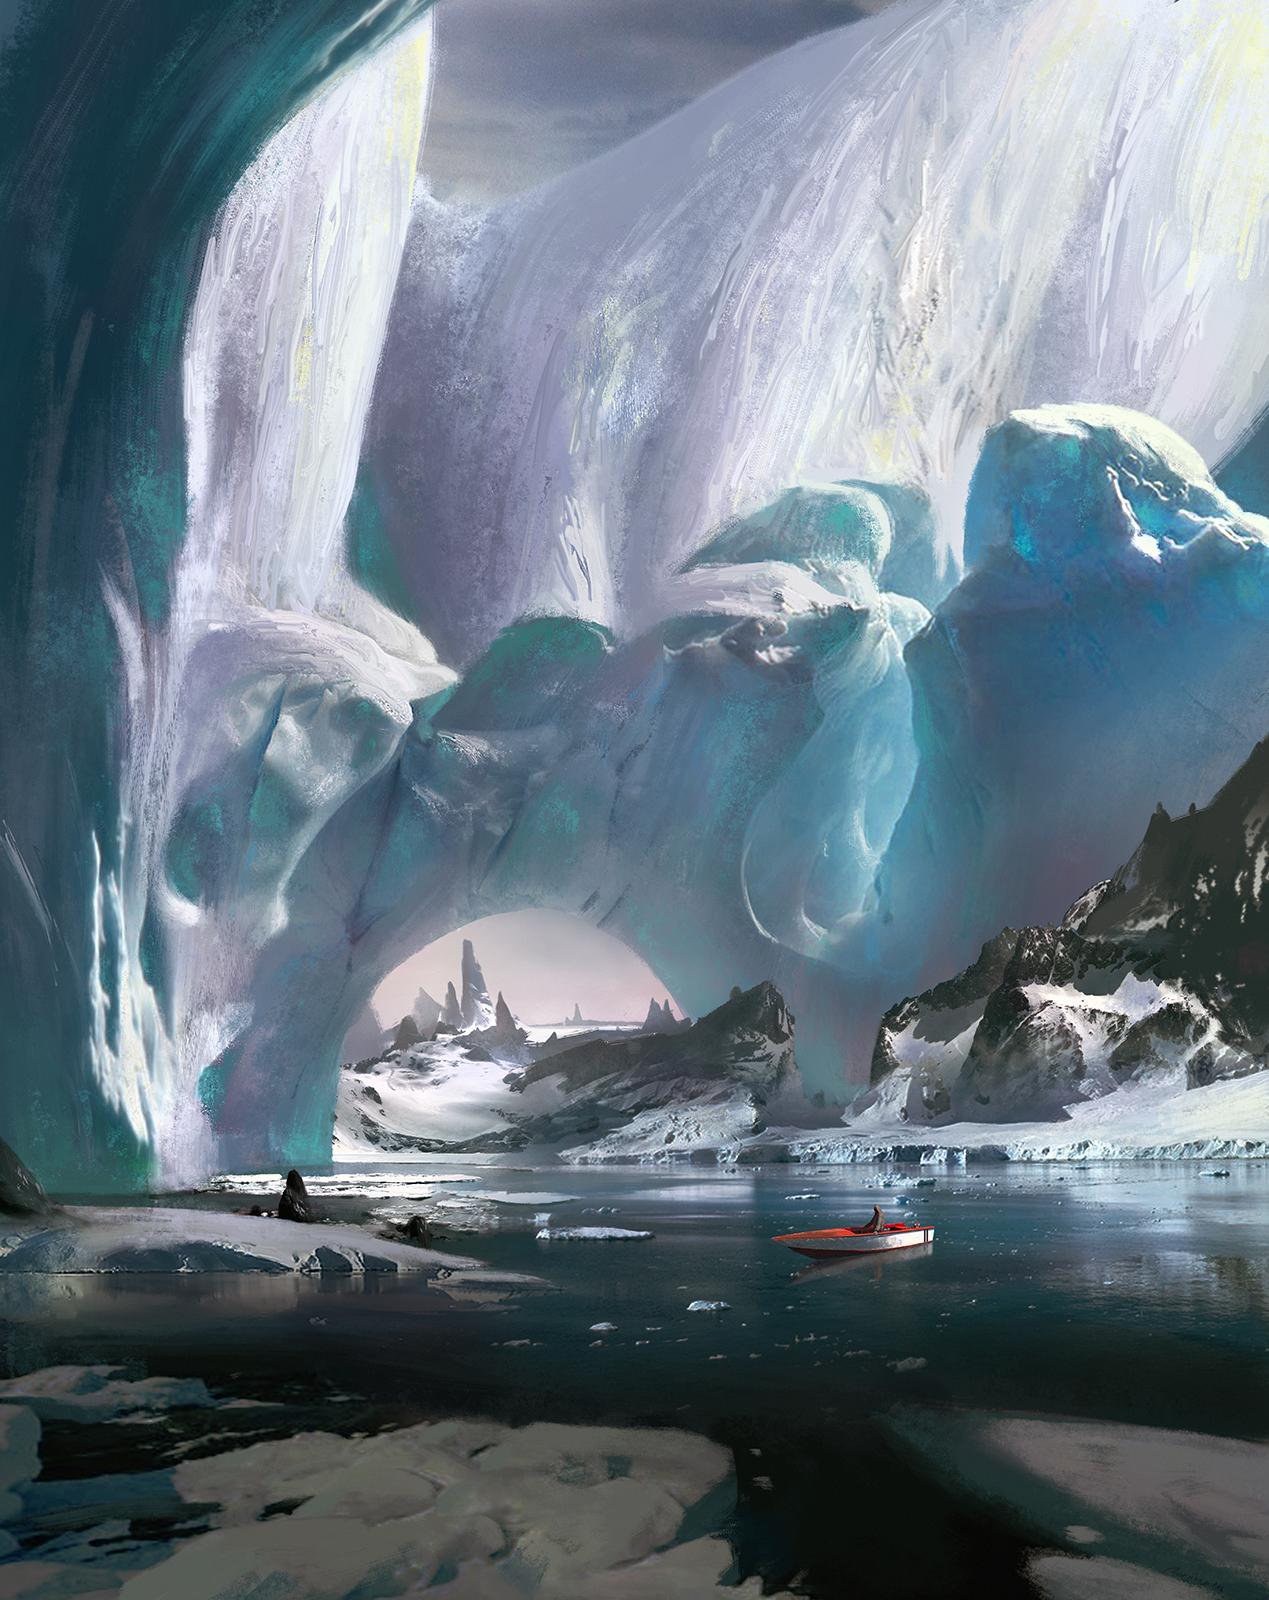 Ruxinggao ice capped mountain 1 5833999d uclk